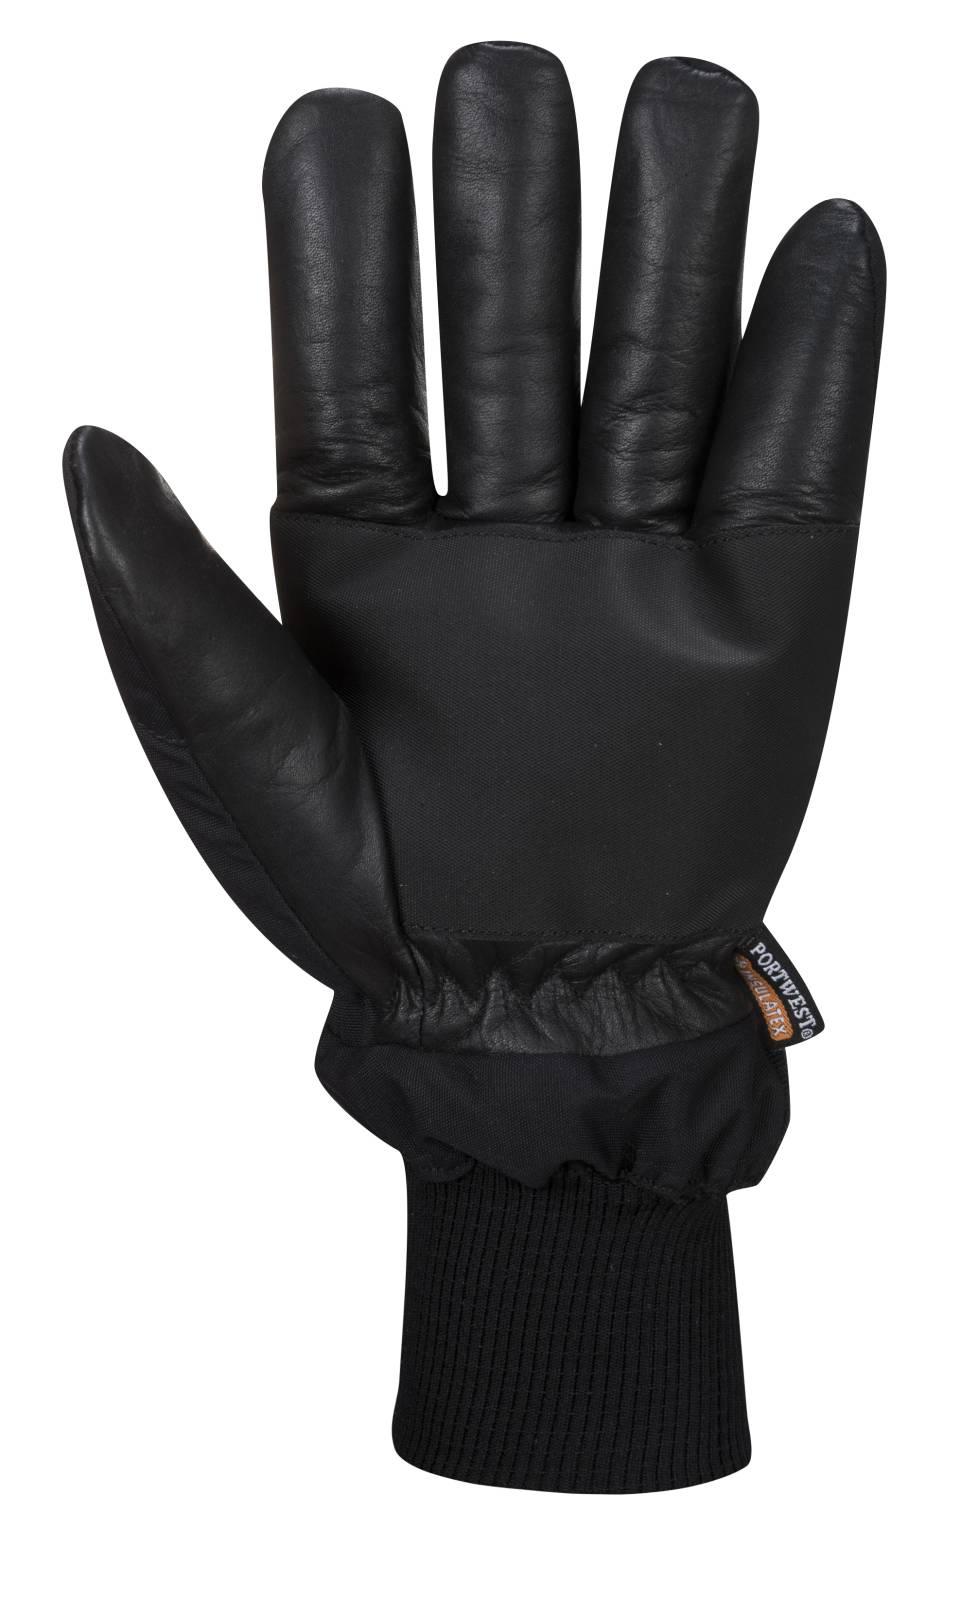 Portwest Handschoenen A751 Waterdicht black(BK)